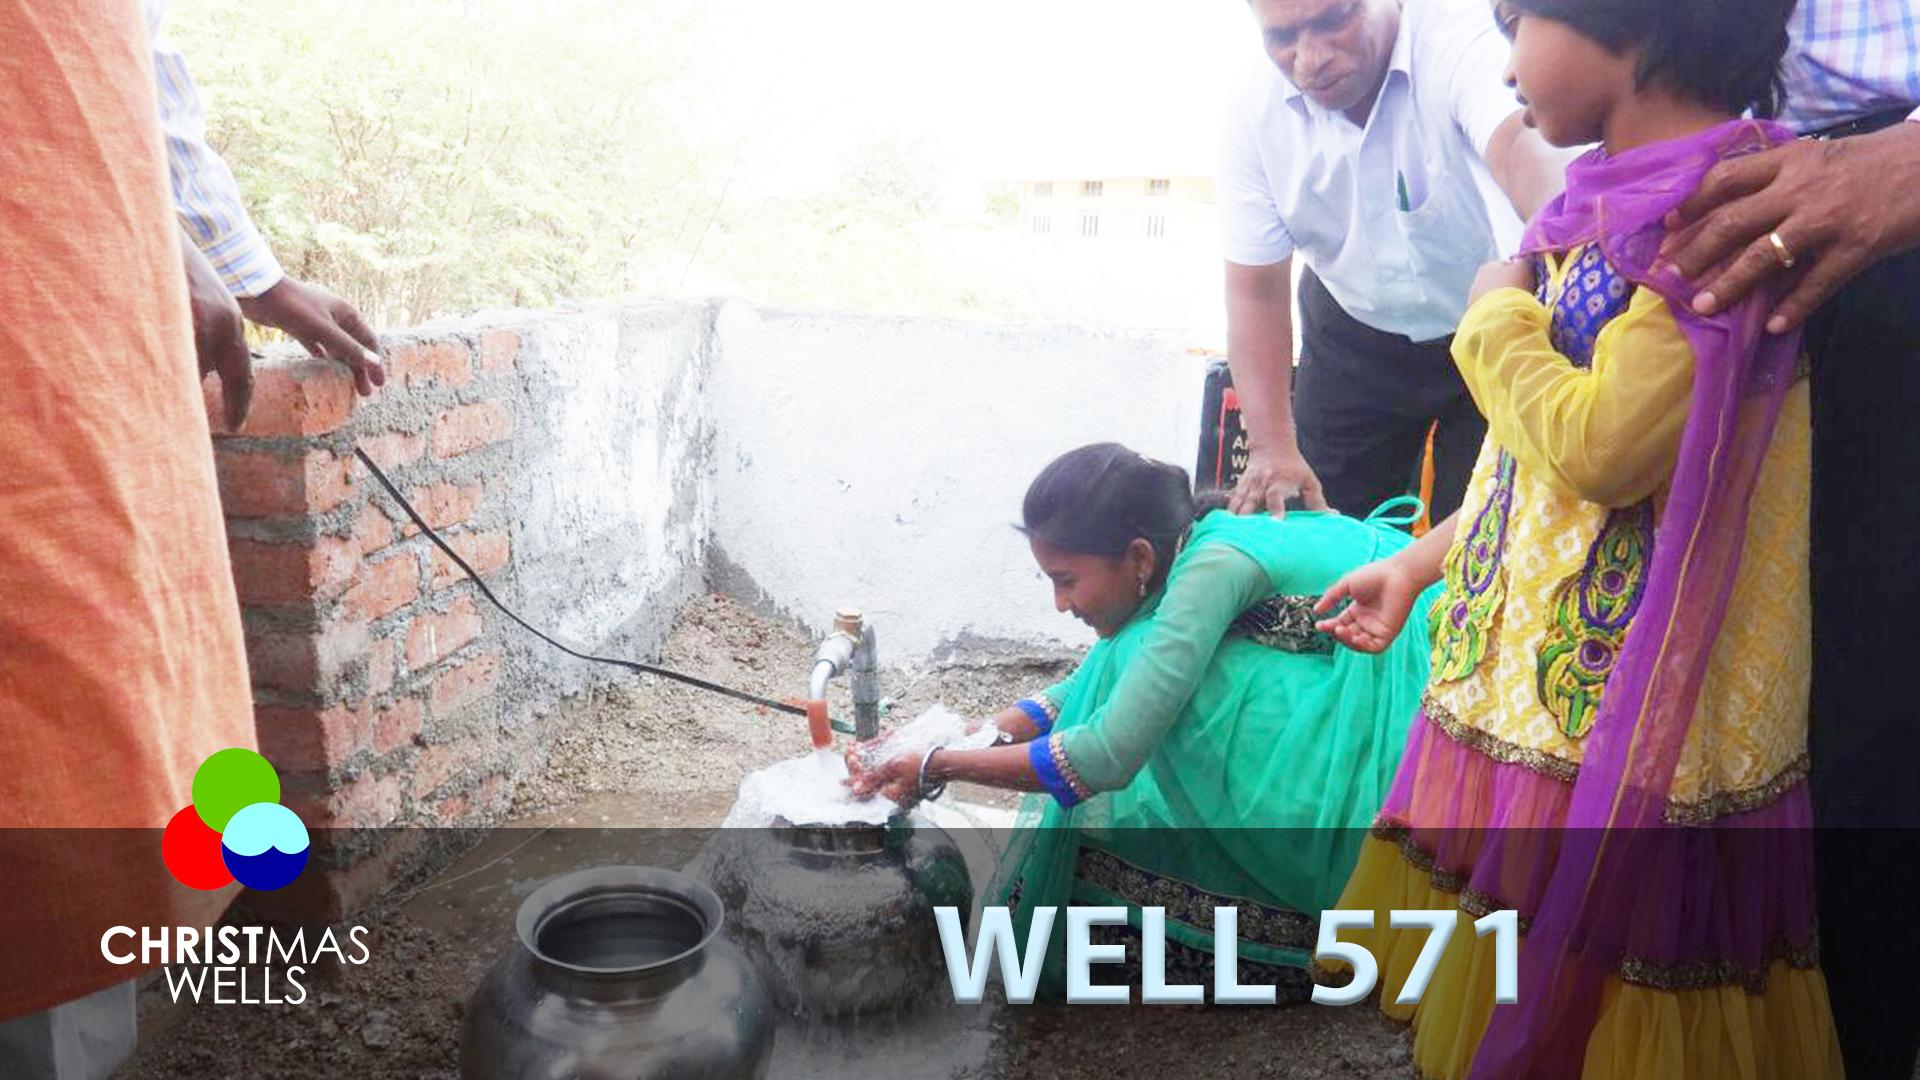 571_Wells-Set_2016-02_India_1920x1080.jpg